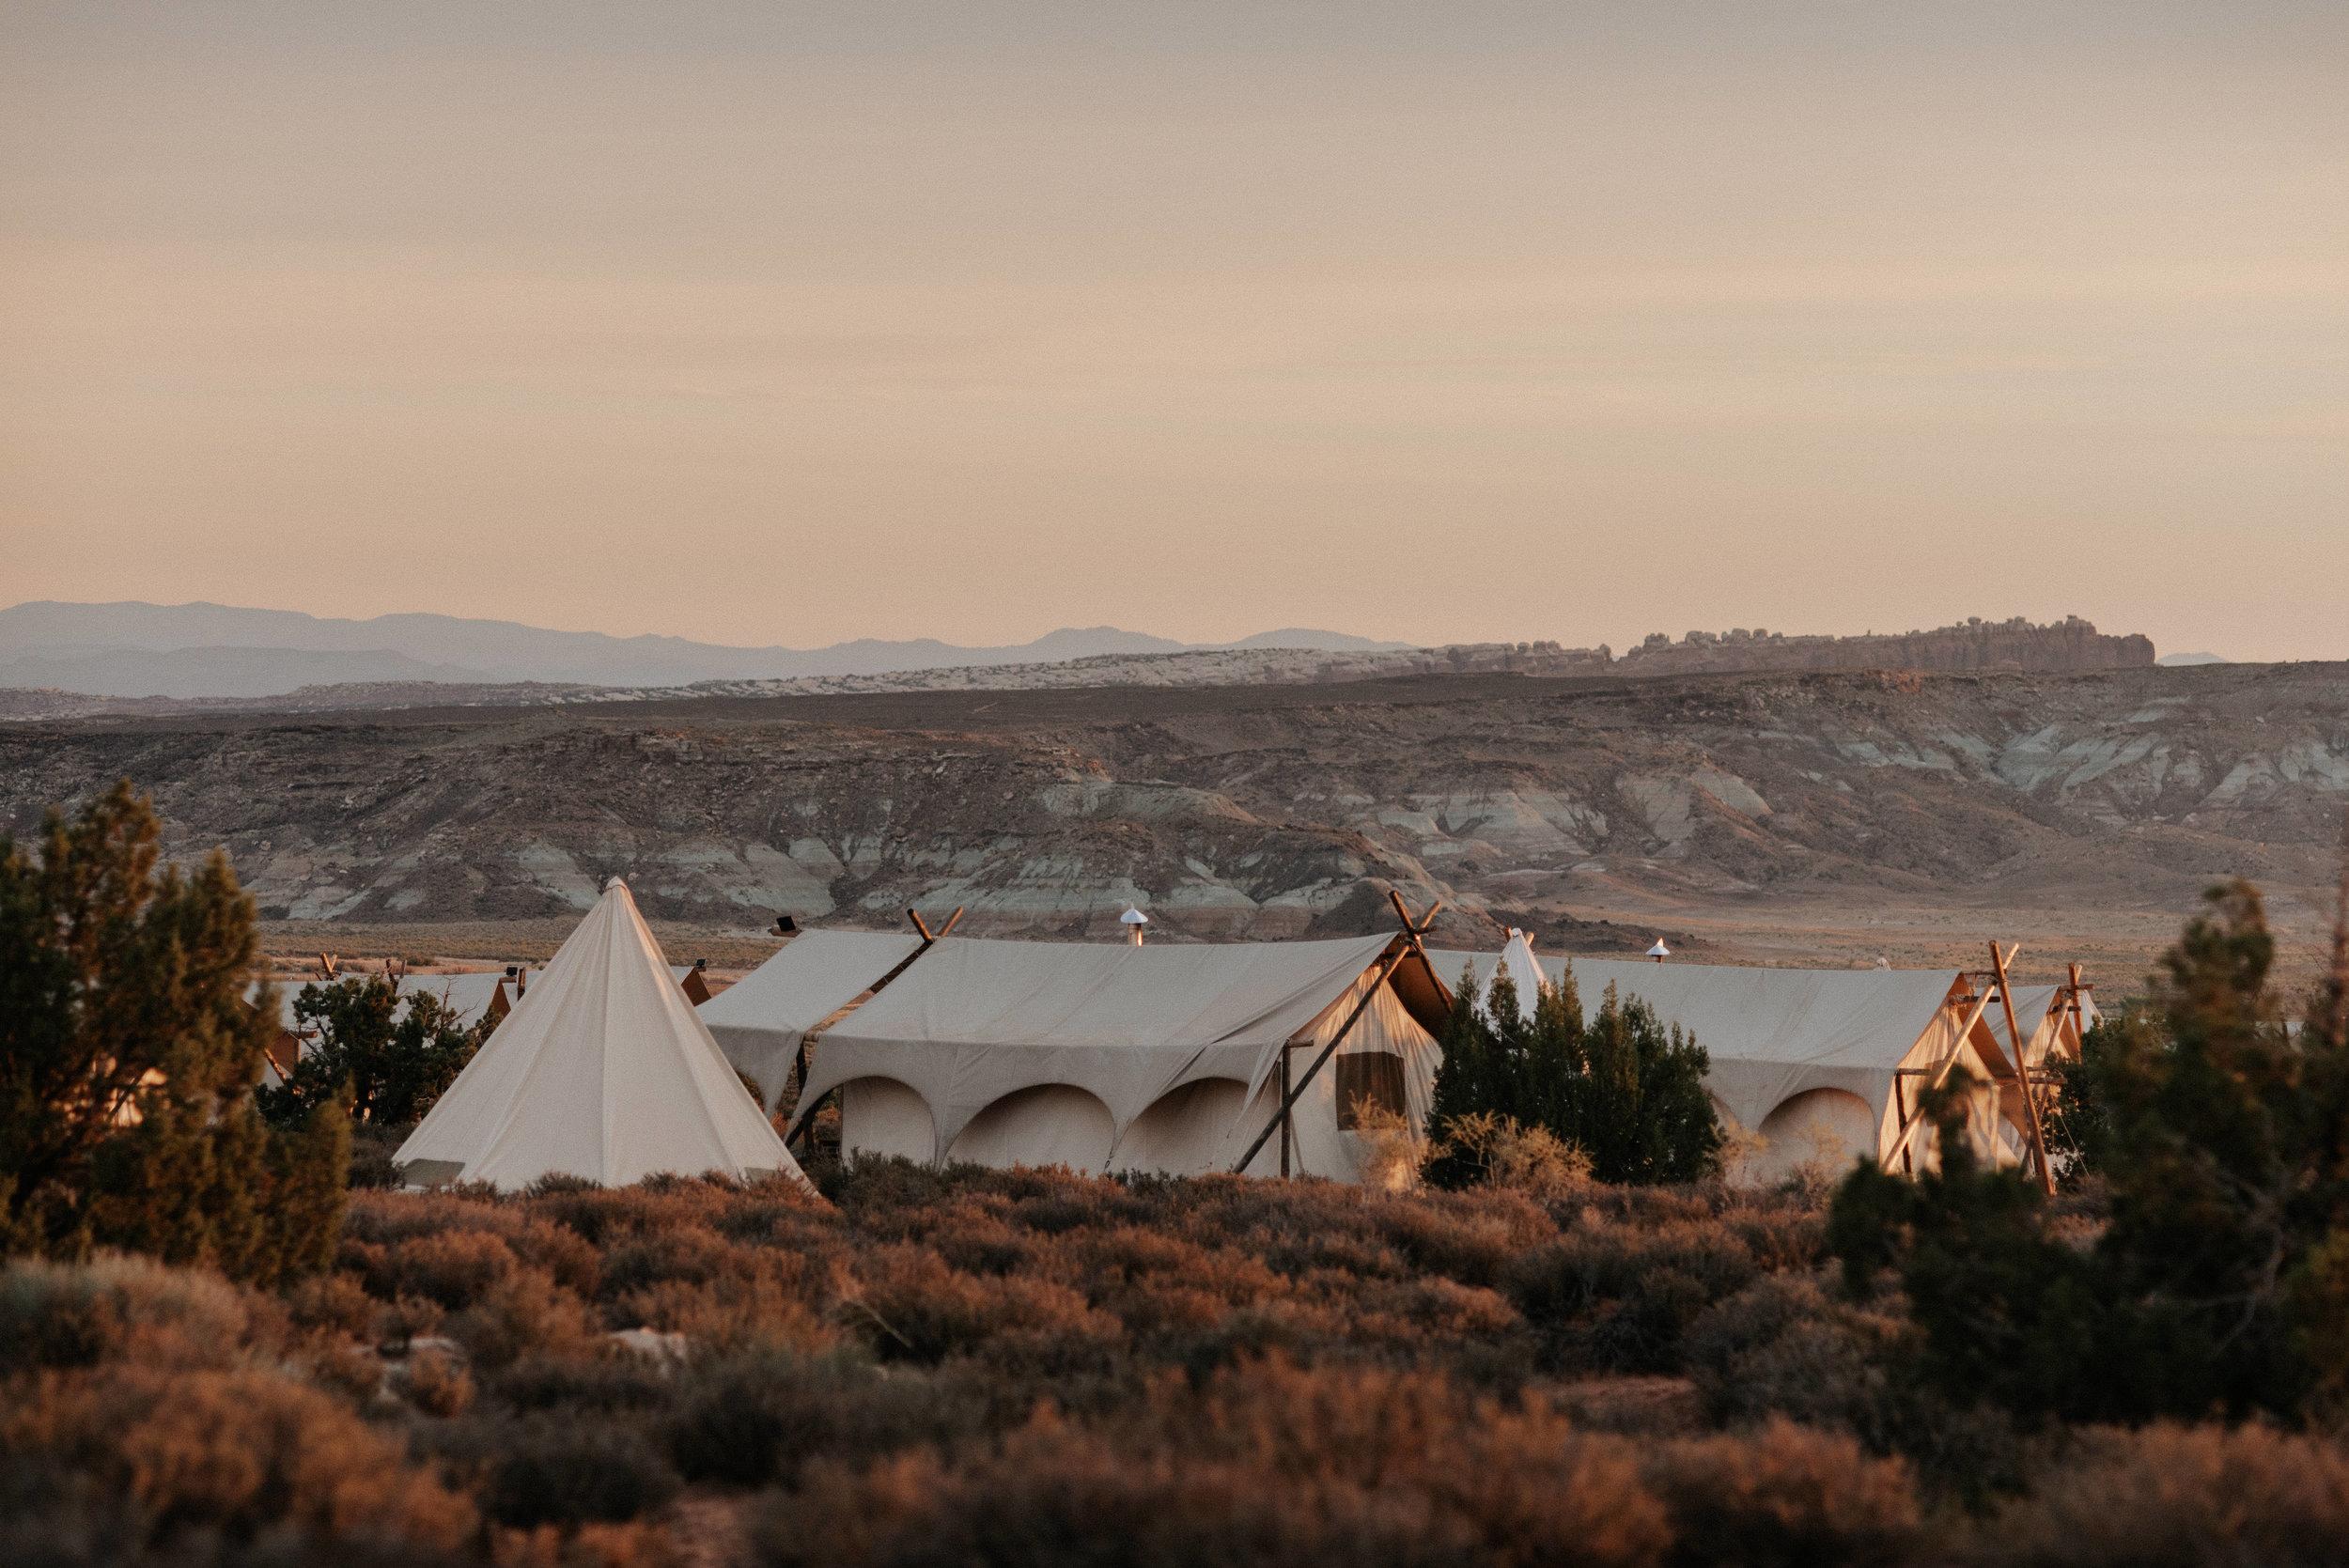 Utah-National-Park-Roadtrip-318.jpg